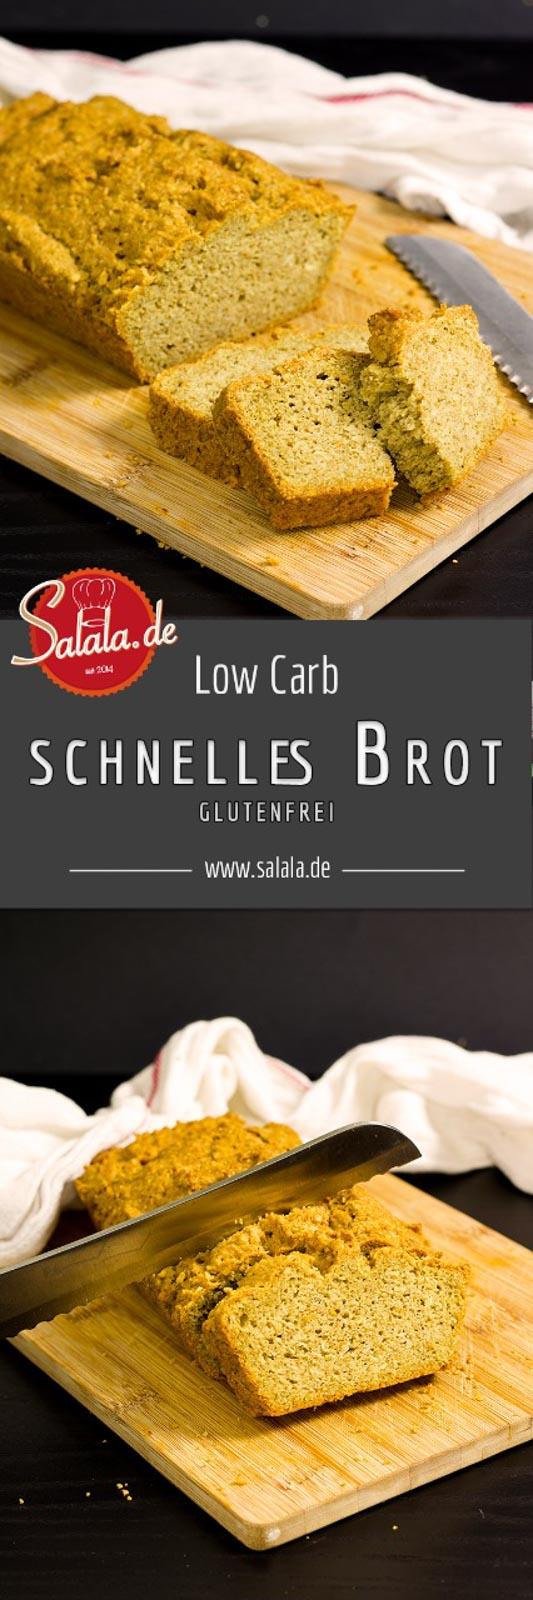 Schnelles ketogenes Low Carb Brot - by salala.de - - glutenfrei backen ohne Mehl ketogenes Brot Low Carb Frühstück